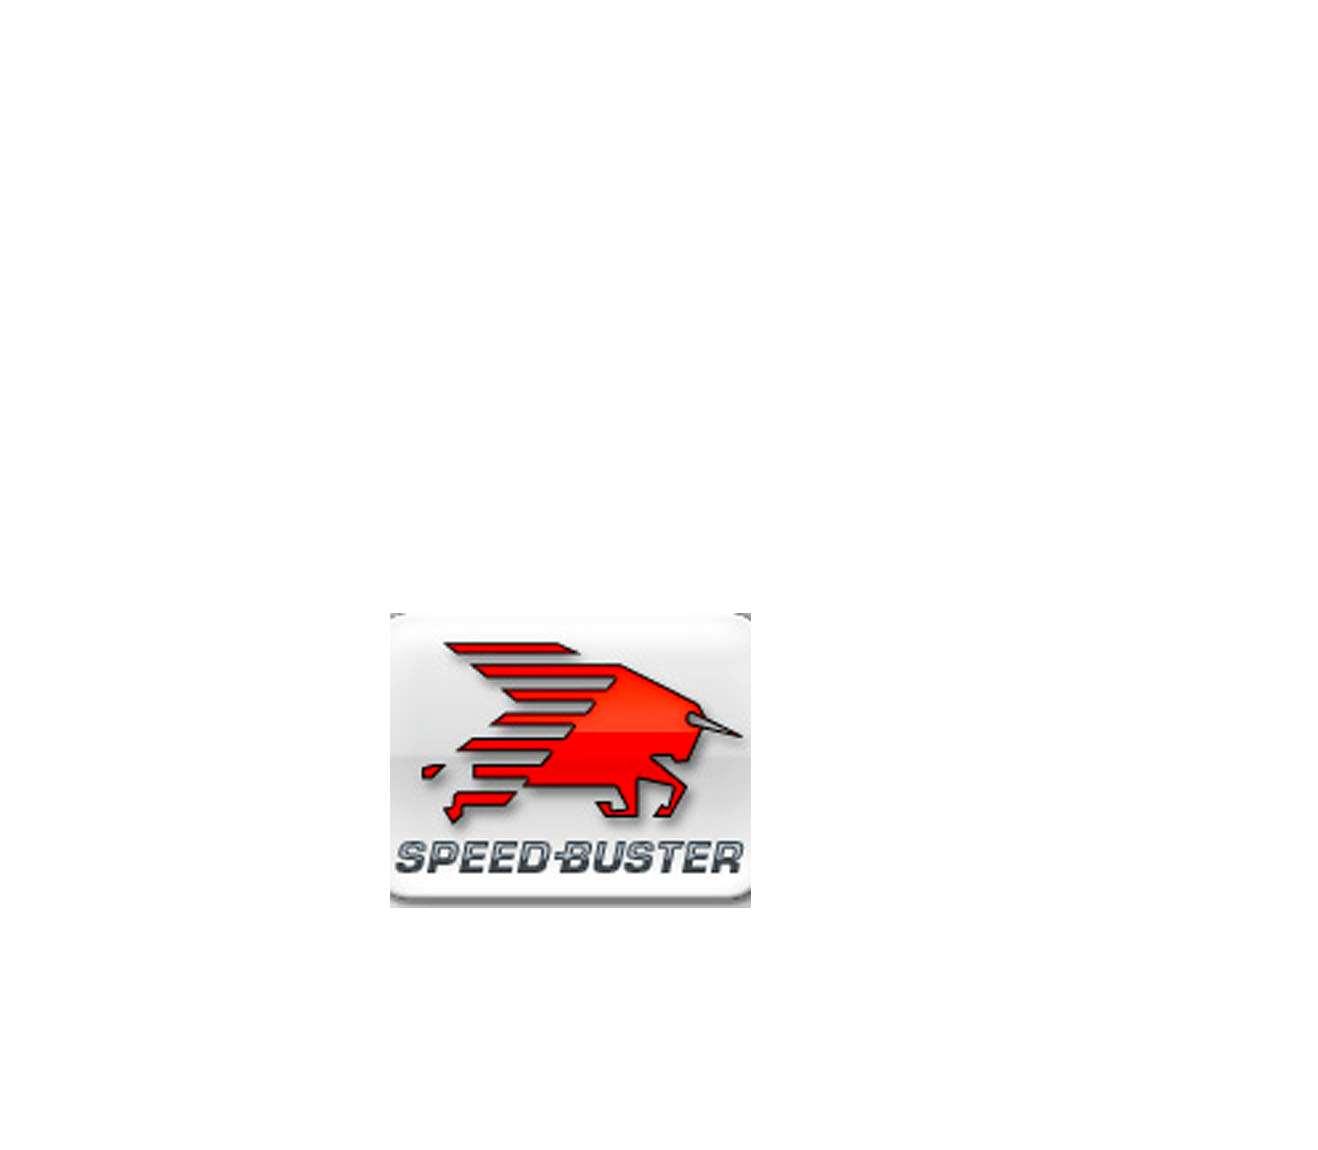 speed buster italia elaborare gt tuning racing magazine elaborazioni auto. Black Bedroom Furniture Sets. Home Design Ideas